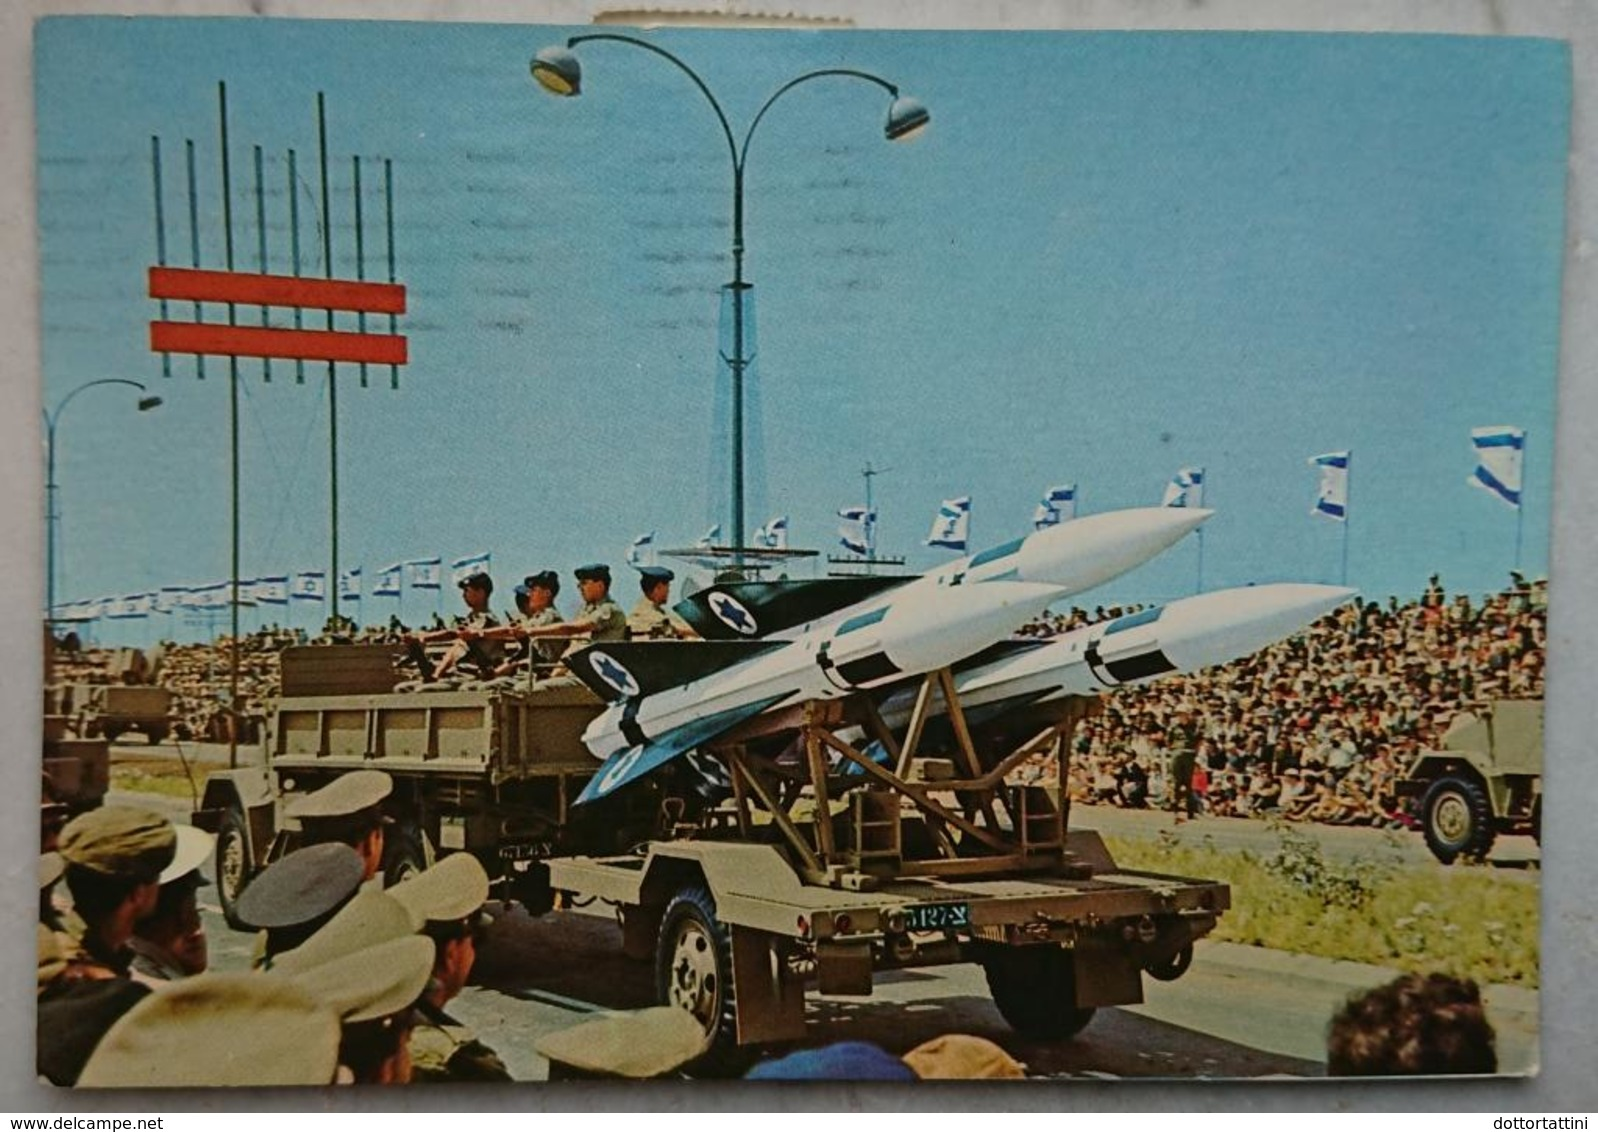 ISRAEL - Israel Defence Force Army - Hawk Anti Aircraft Missiles At The Independence Day Parade Yom Ha'atzmaut - Vg 1968 - Manovre